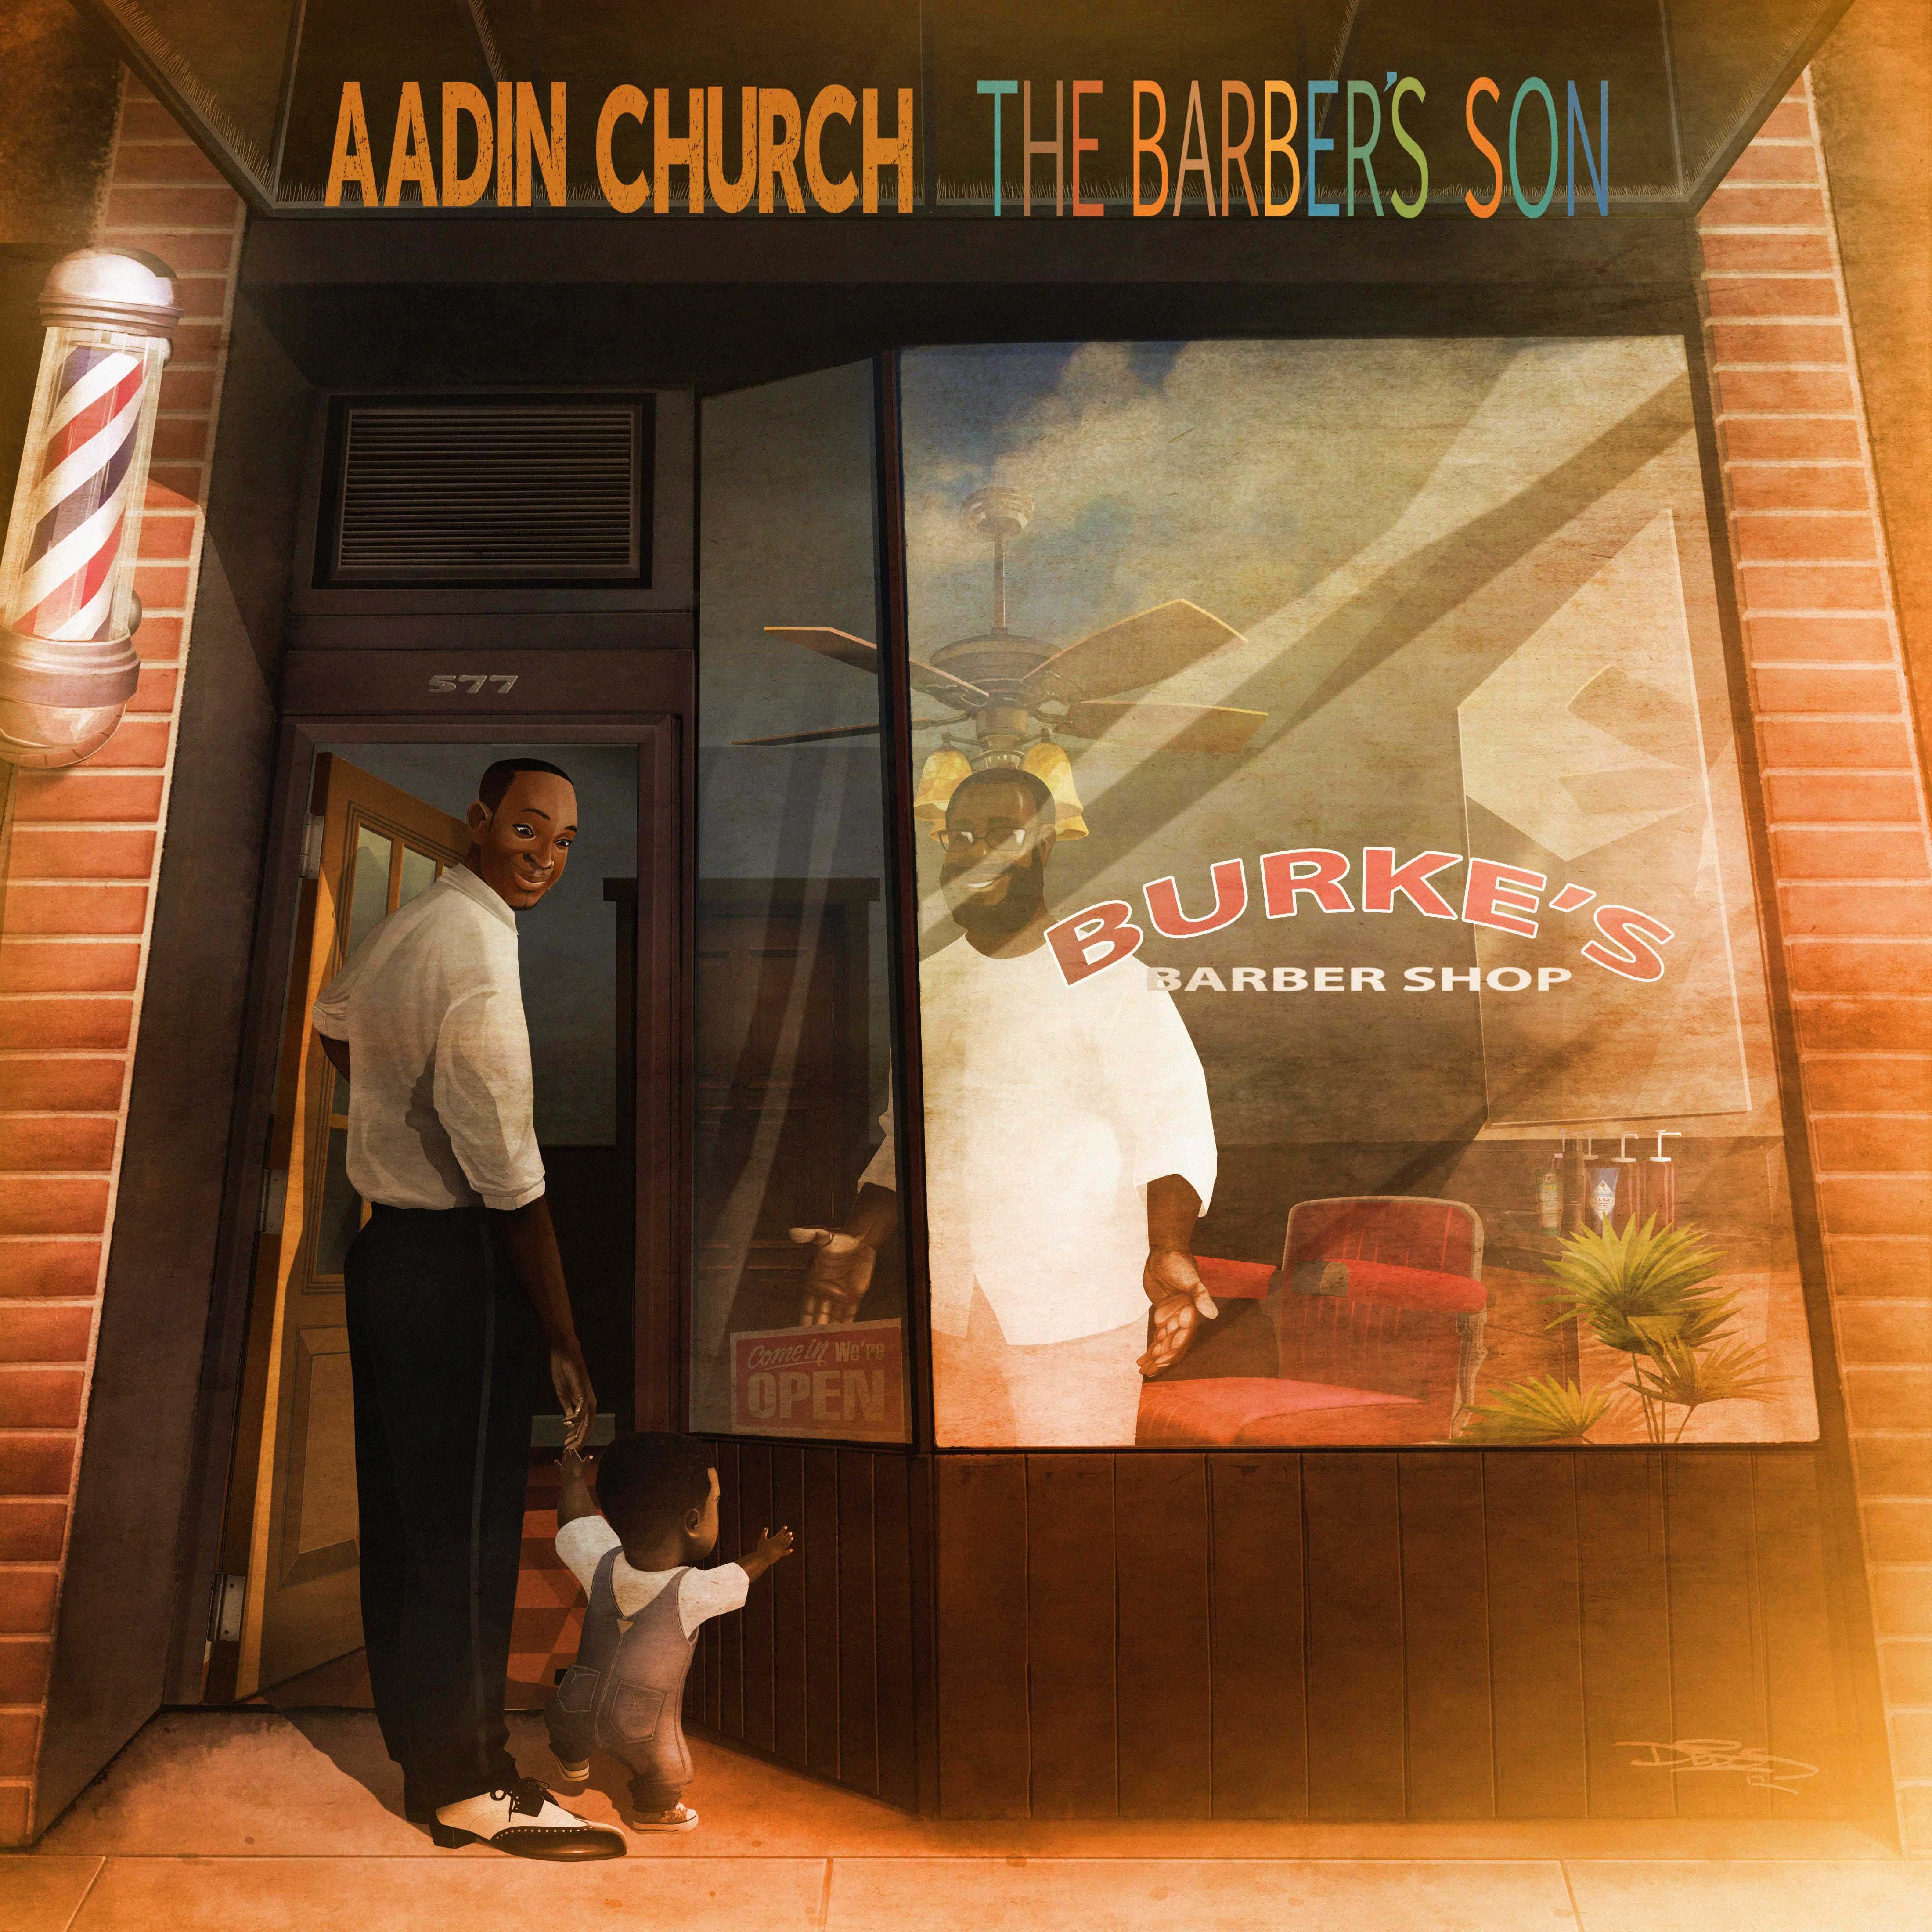 Aadin Church album cover 2012